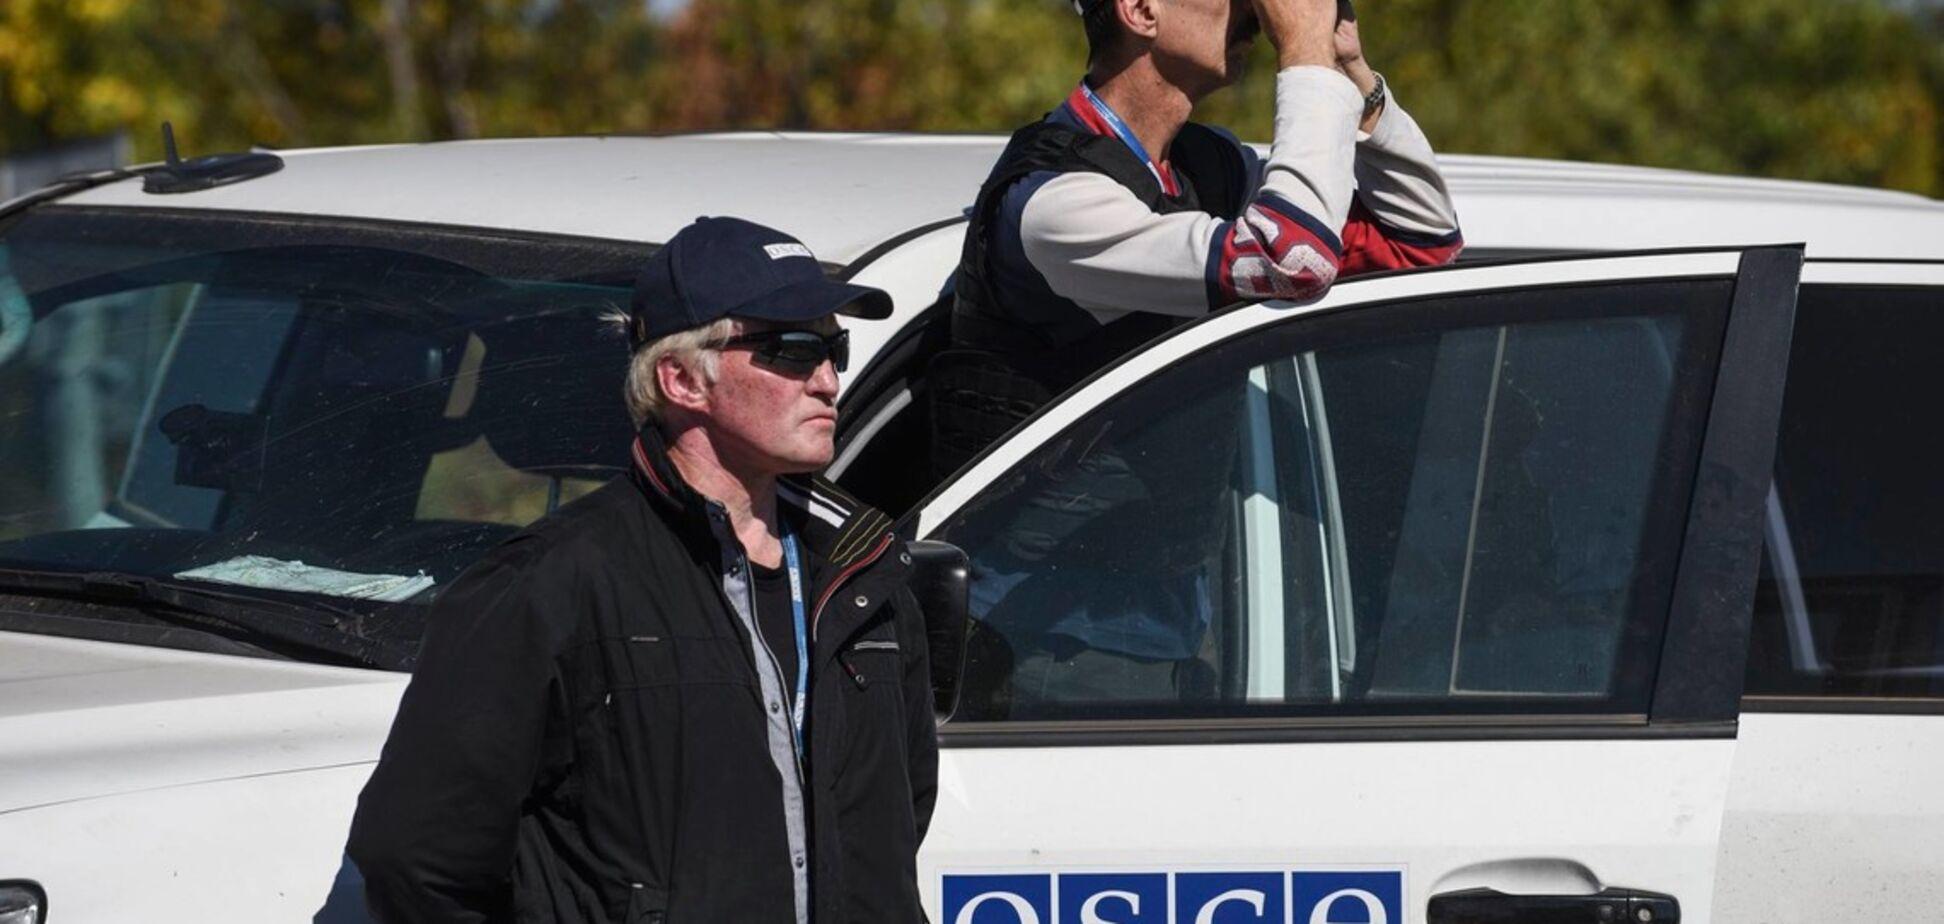 Путину не нужна ОБСЕ на Донбассе: Украину предупредили о серьезной опасности